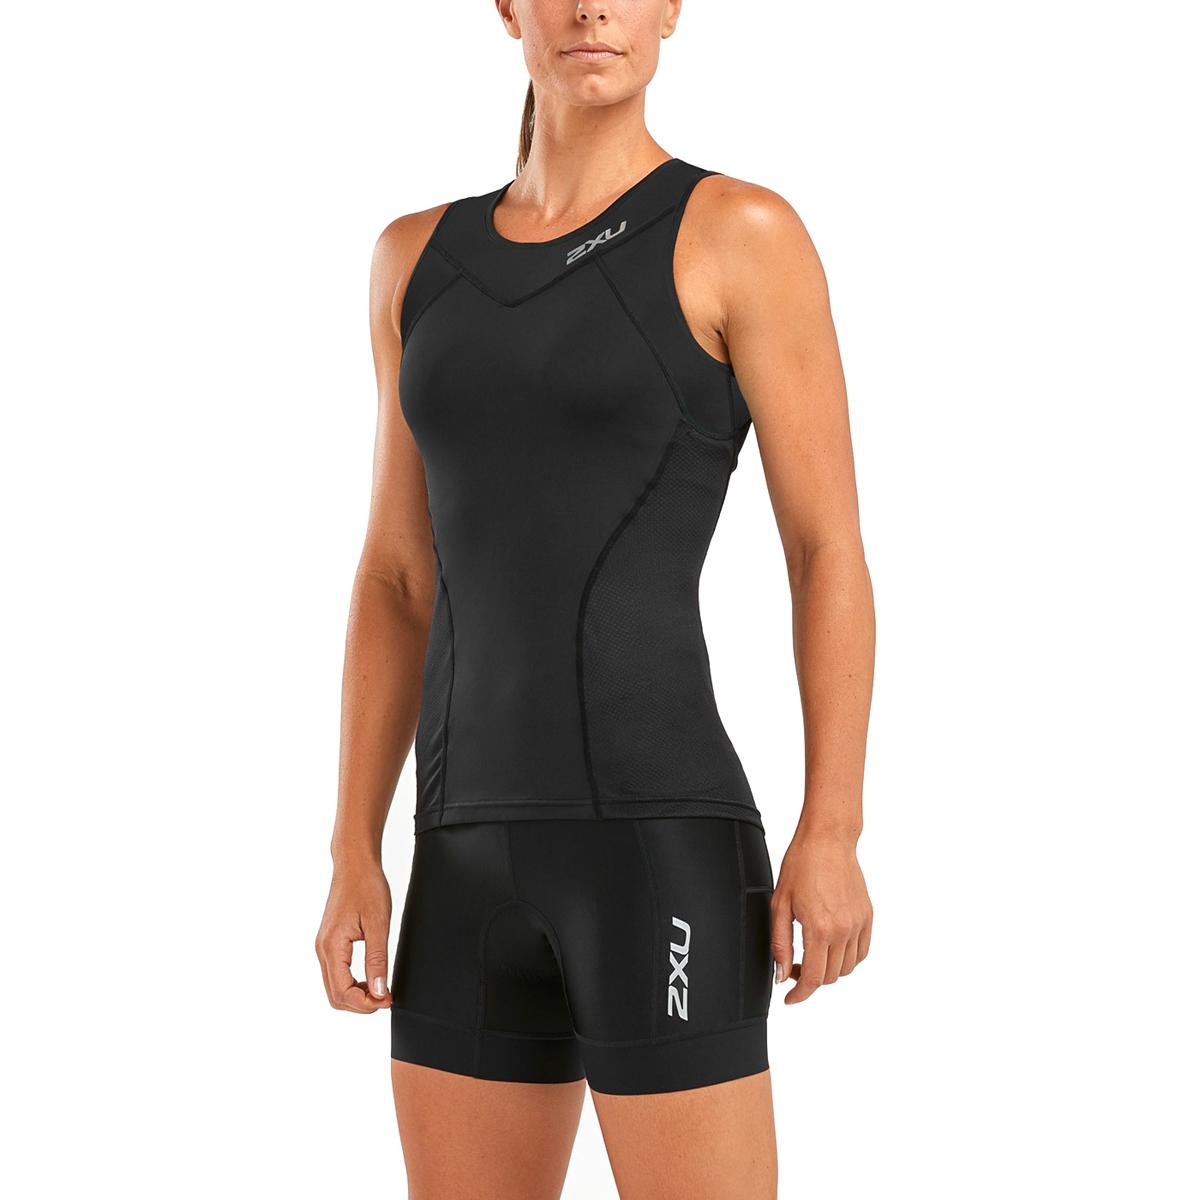 Imagen de 2XU Active Triatlón Camiseta para mujer - black/sunset ombre